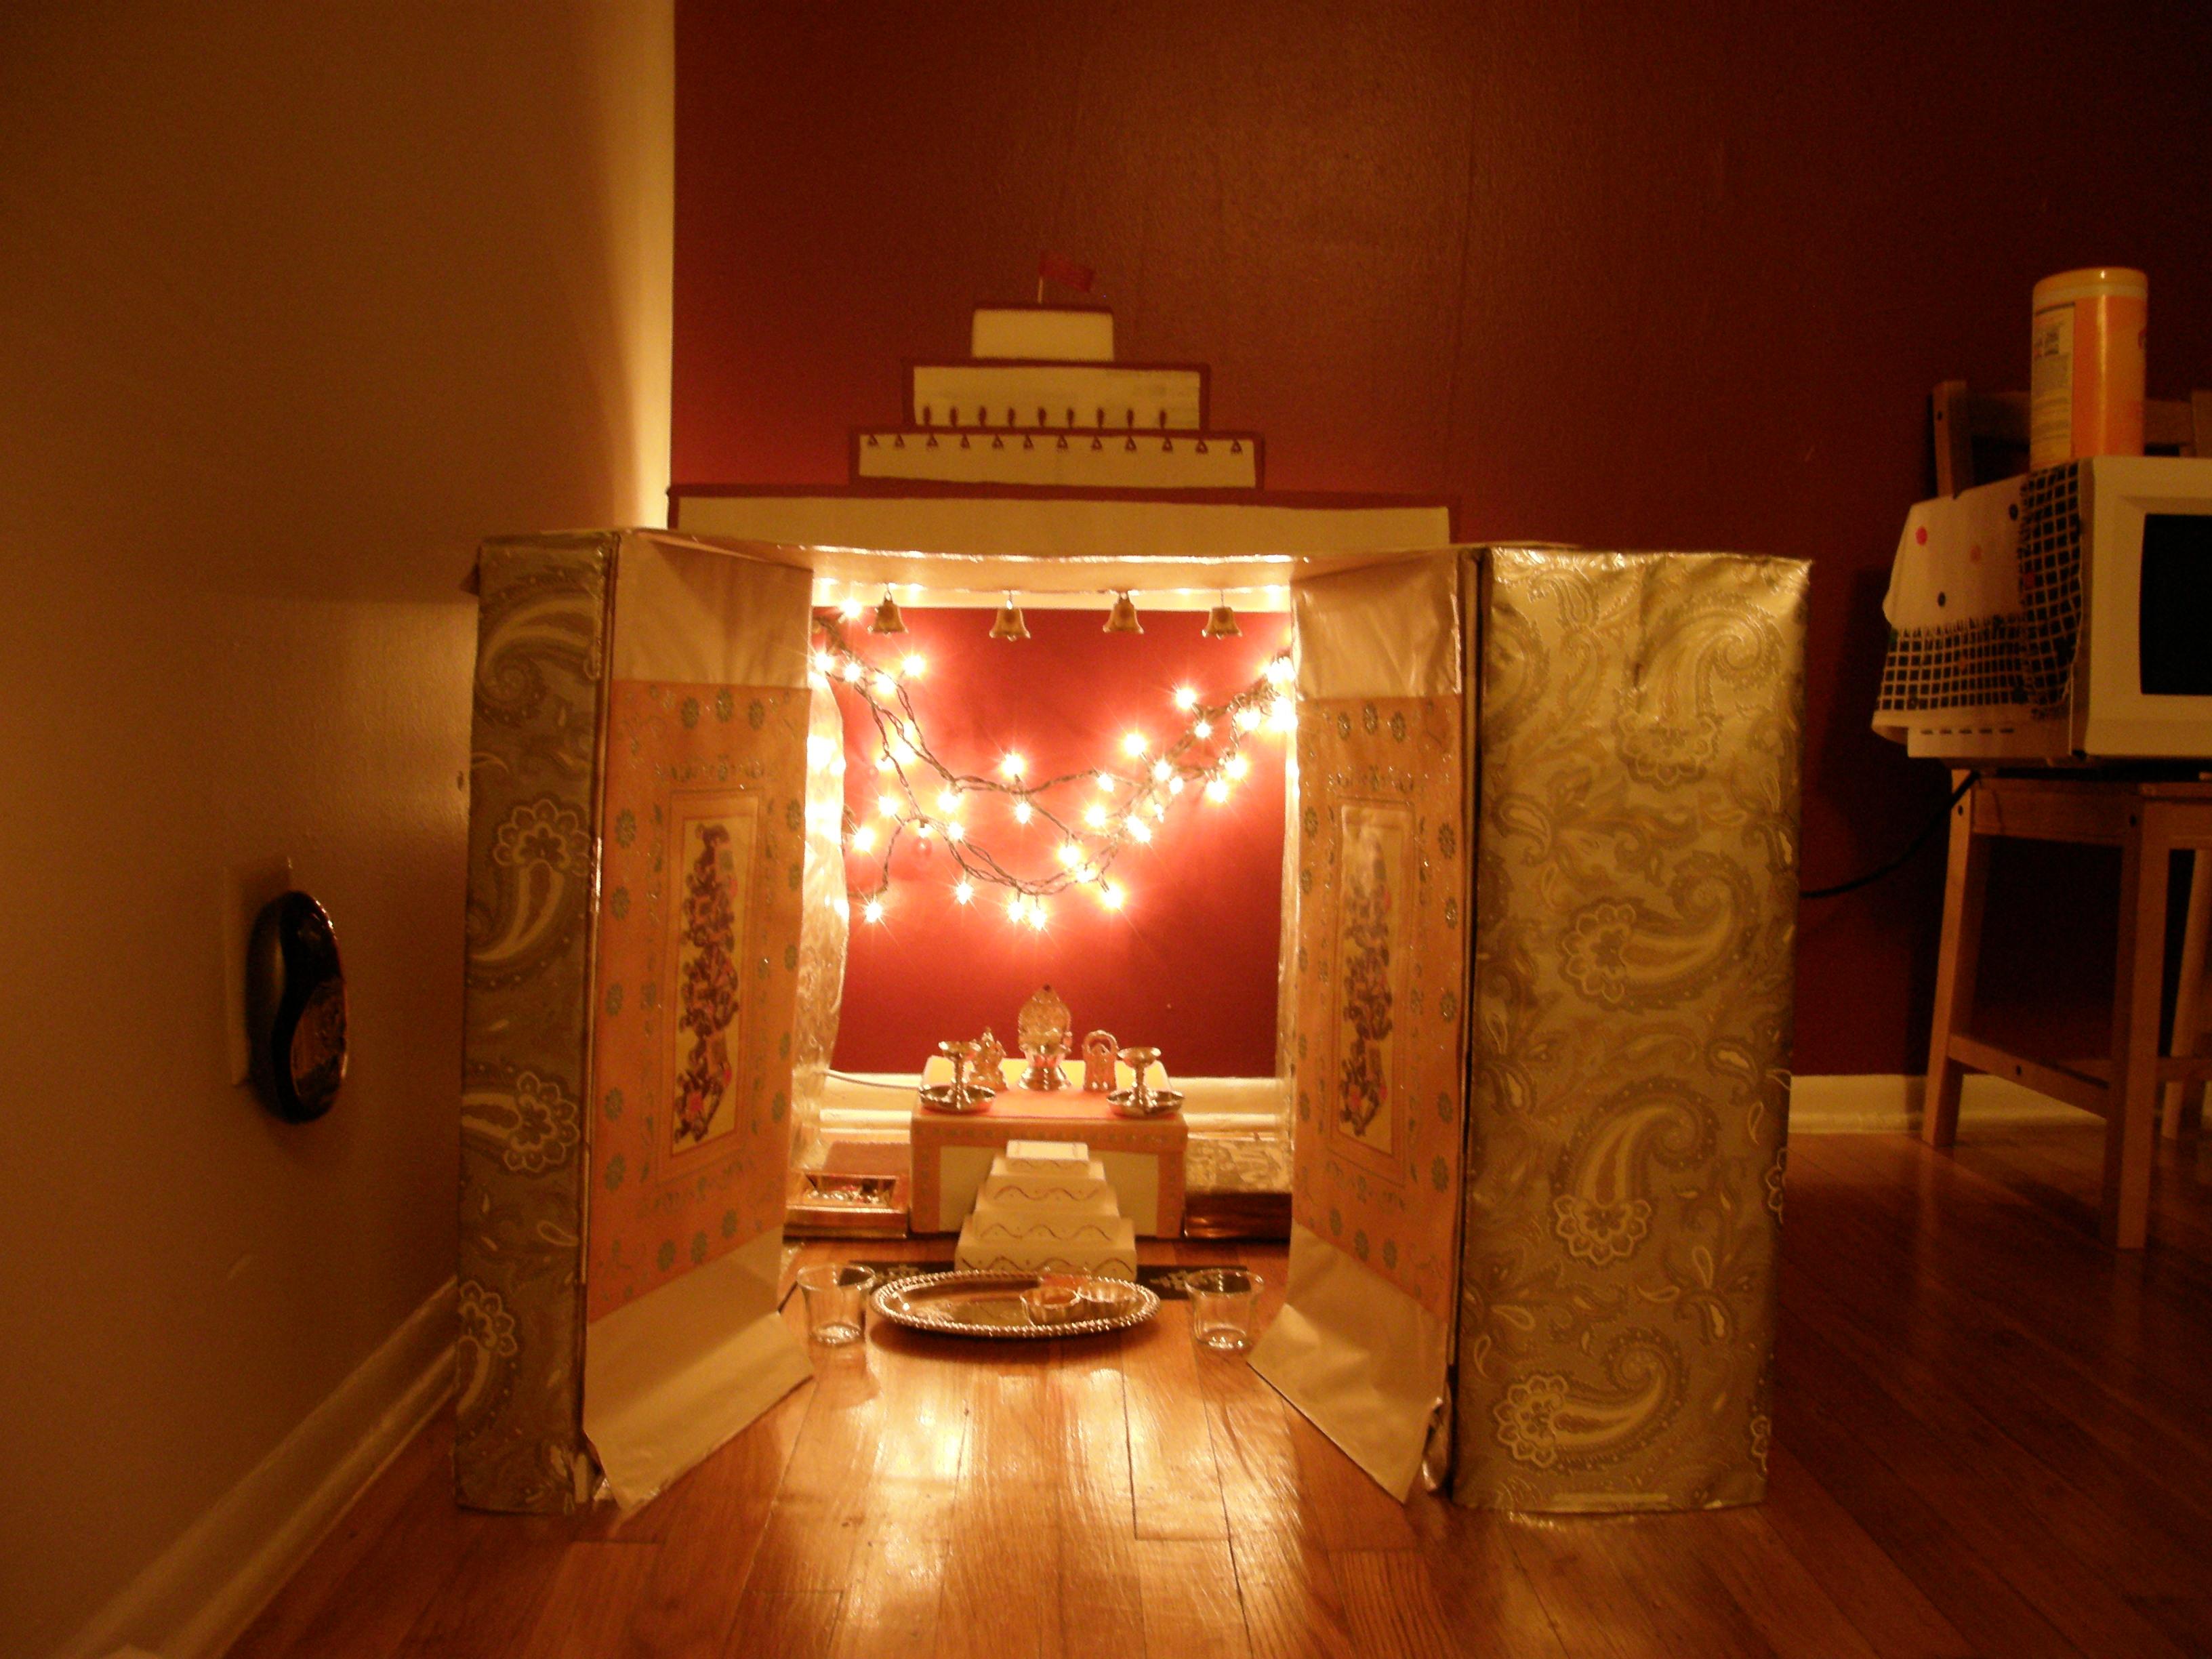 Cardboard temple/shrine at home.